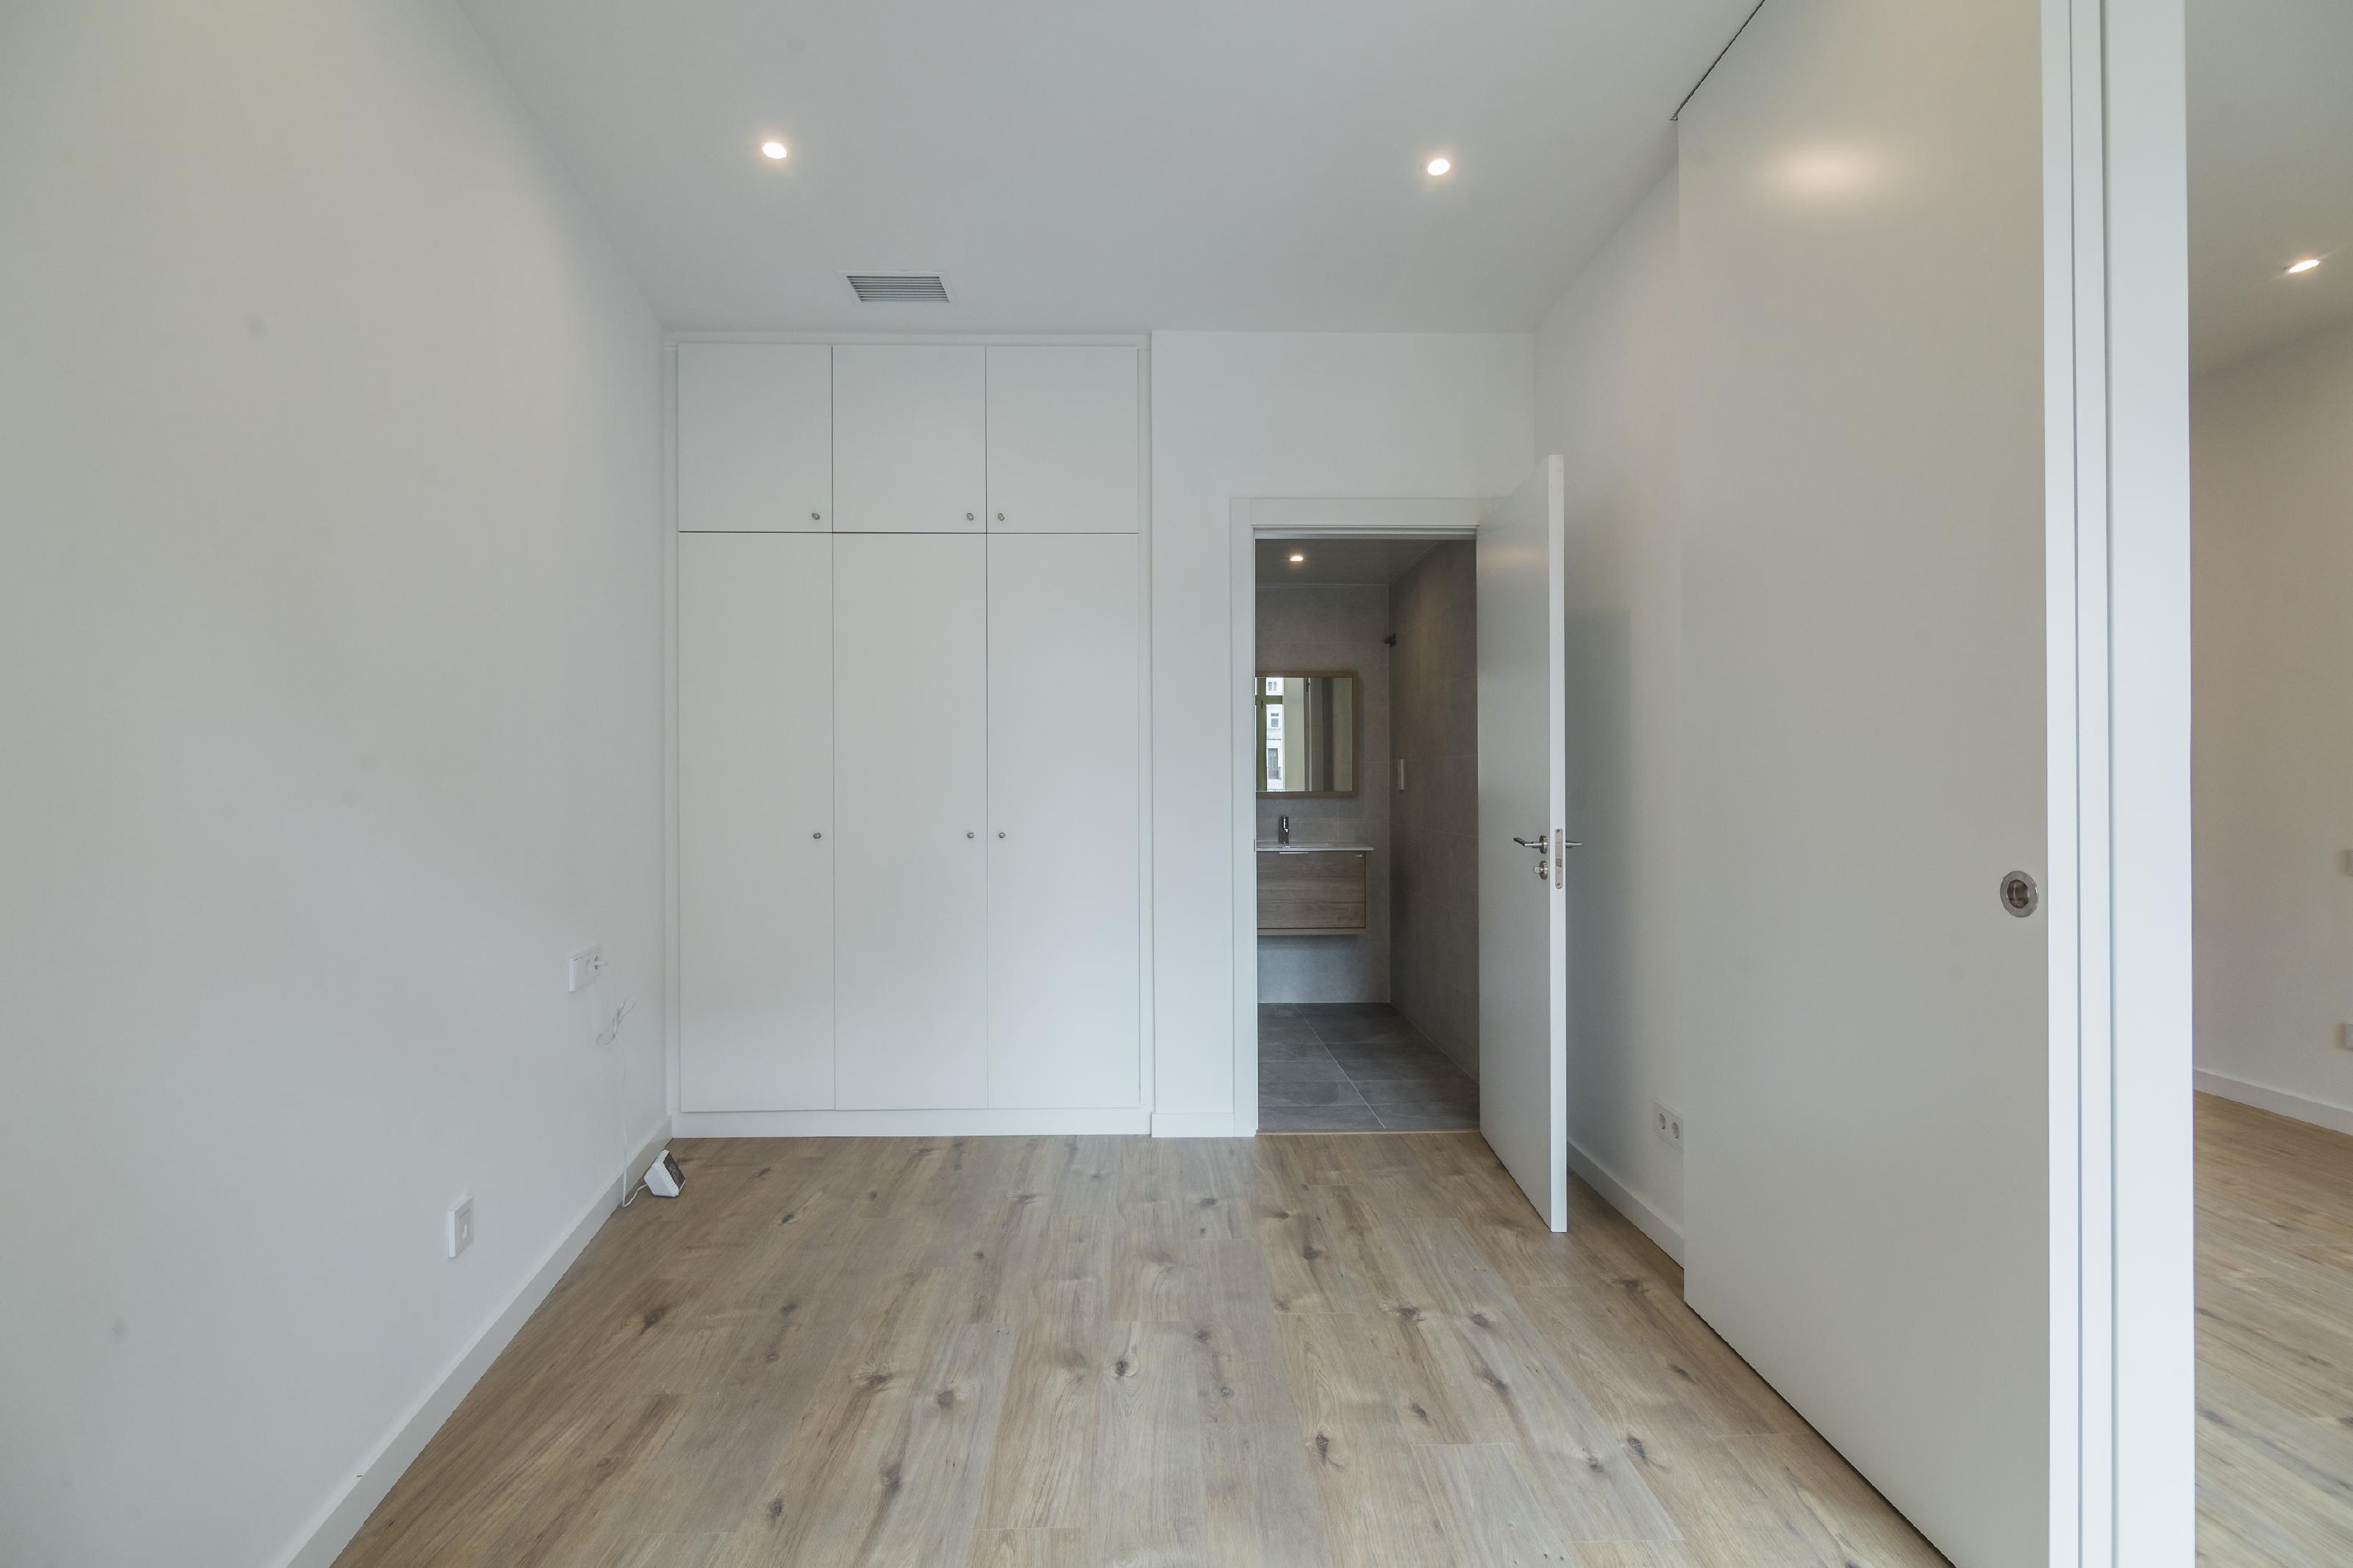 249858 Flat for sale in Eixample, Nova Esquerra Eixample 7